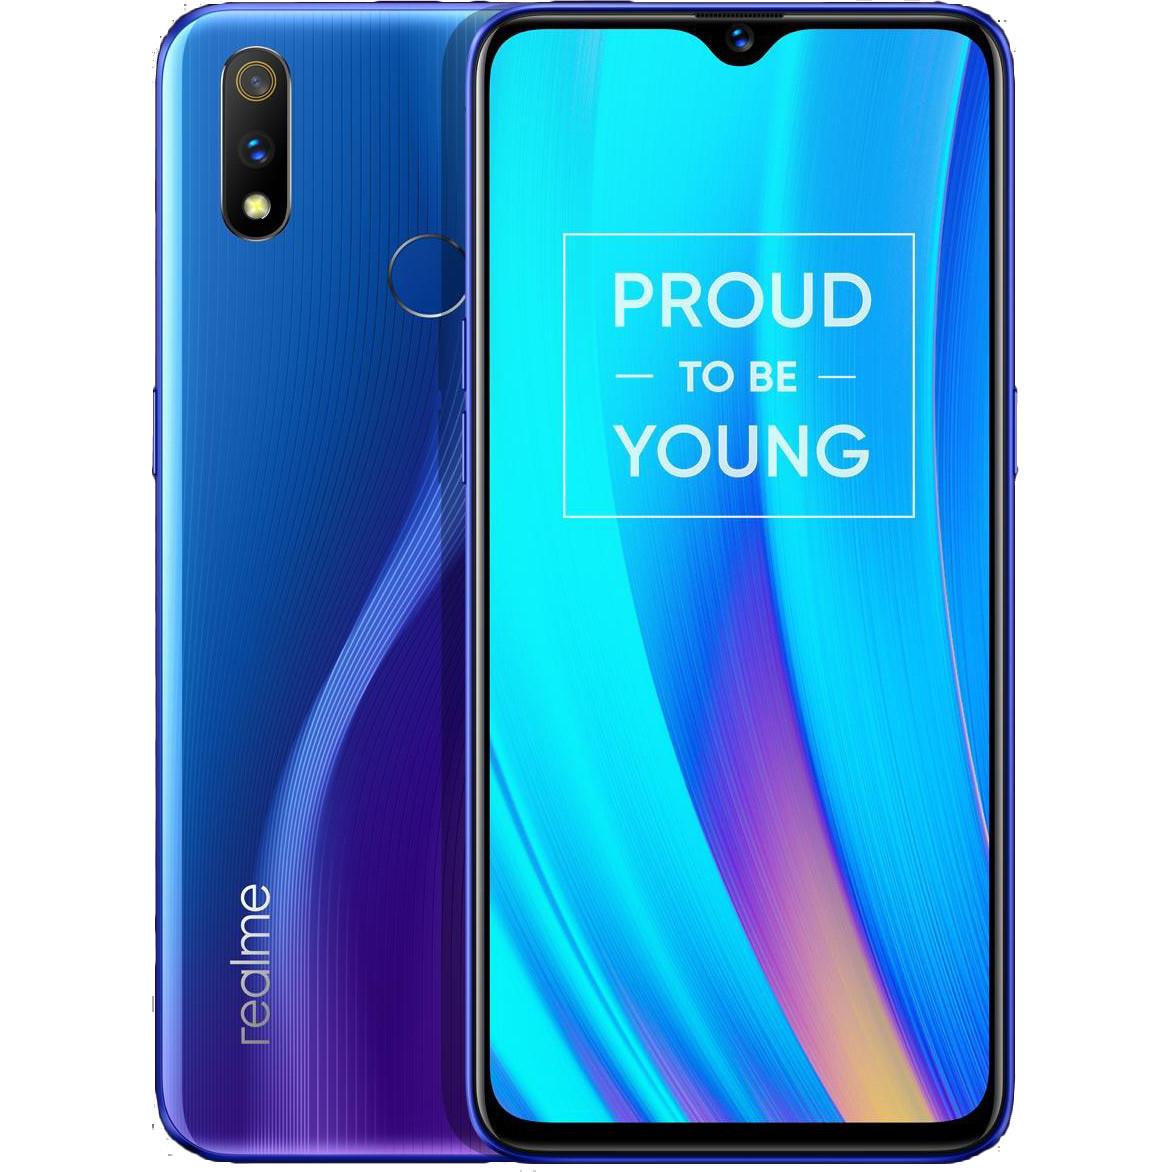 Смартфон OPPO realme 3 Pro RMX1851 blue global version